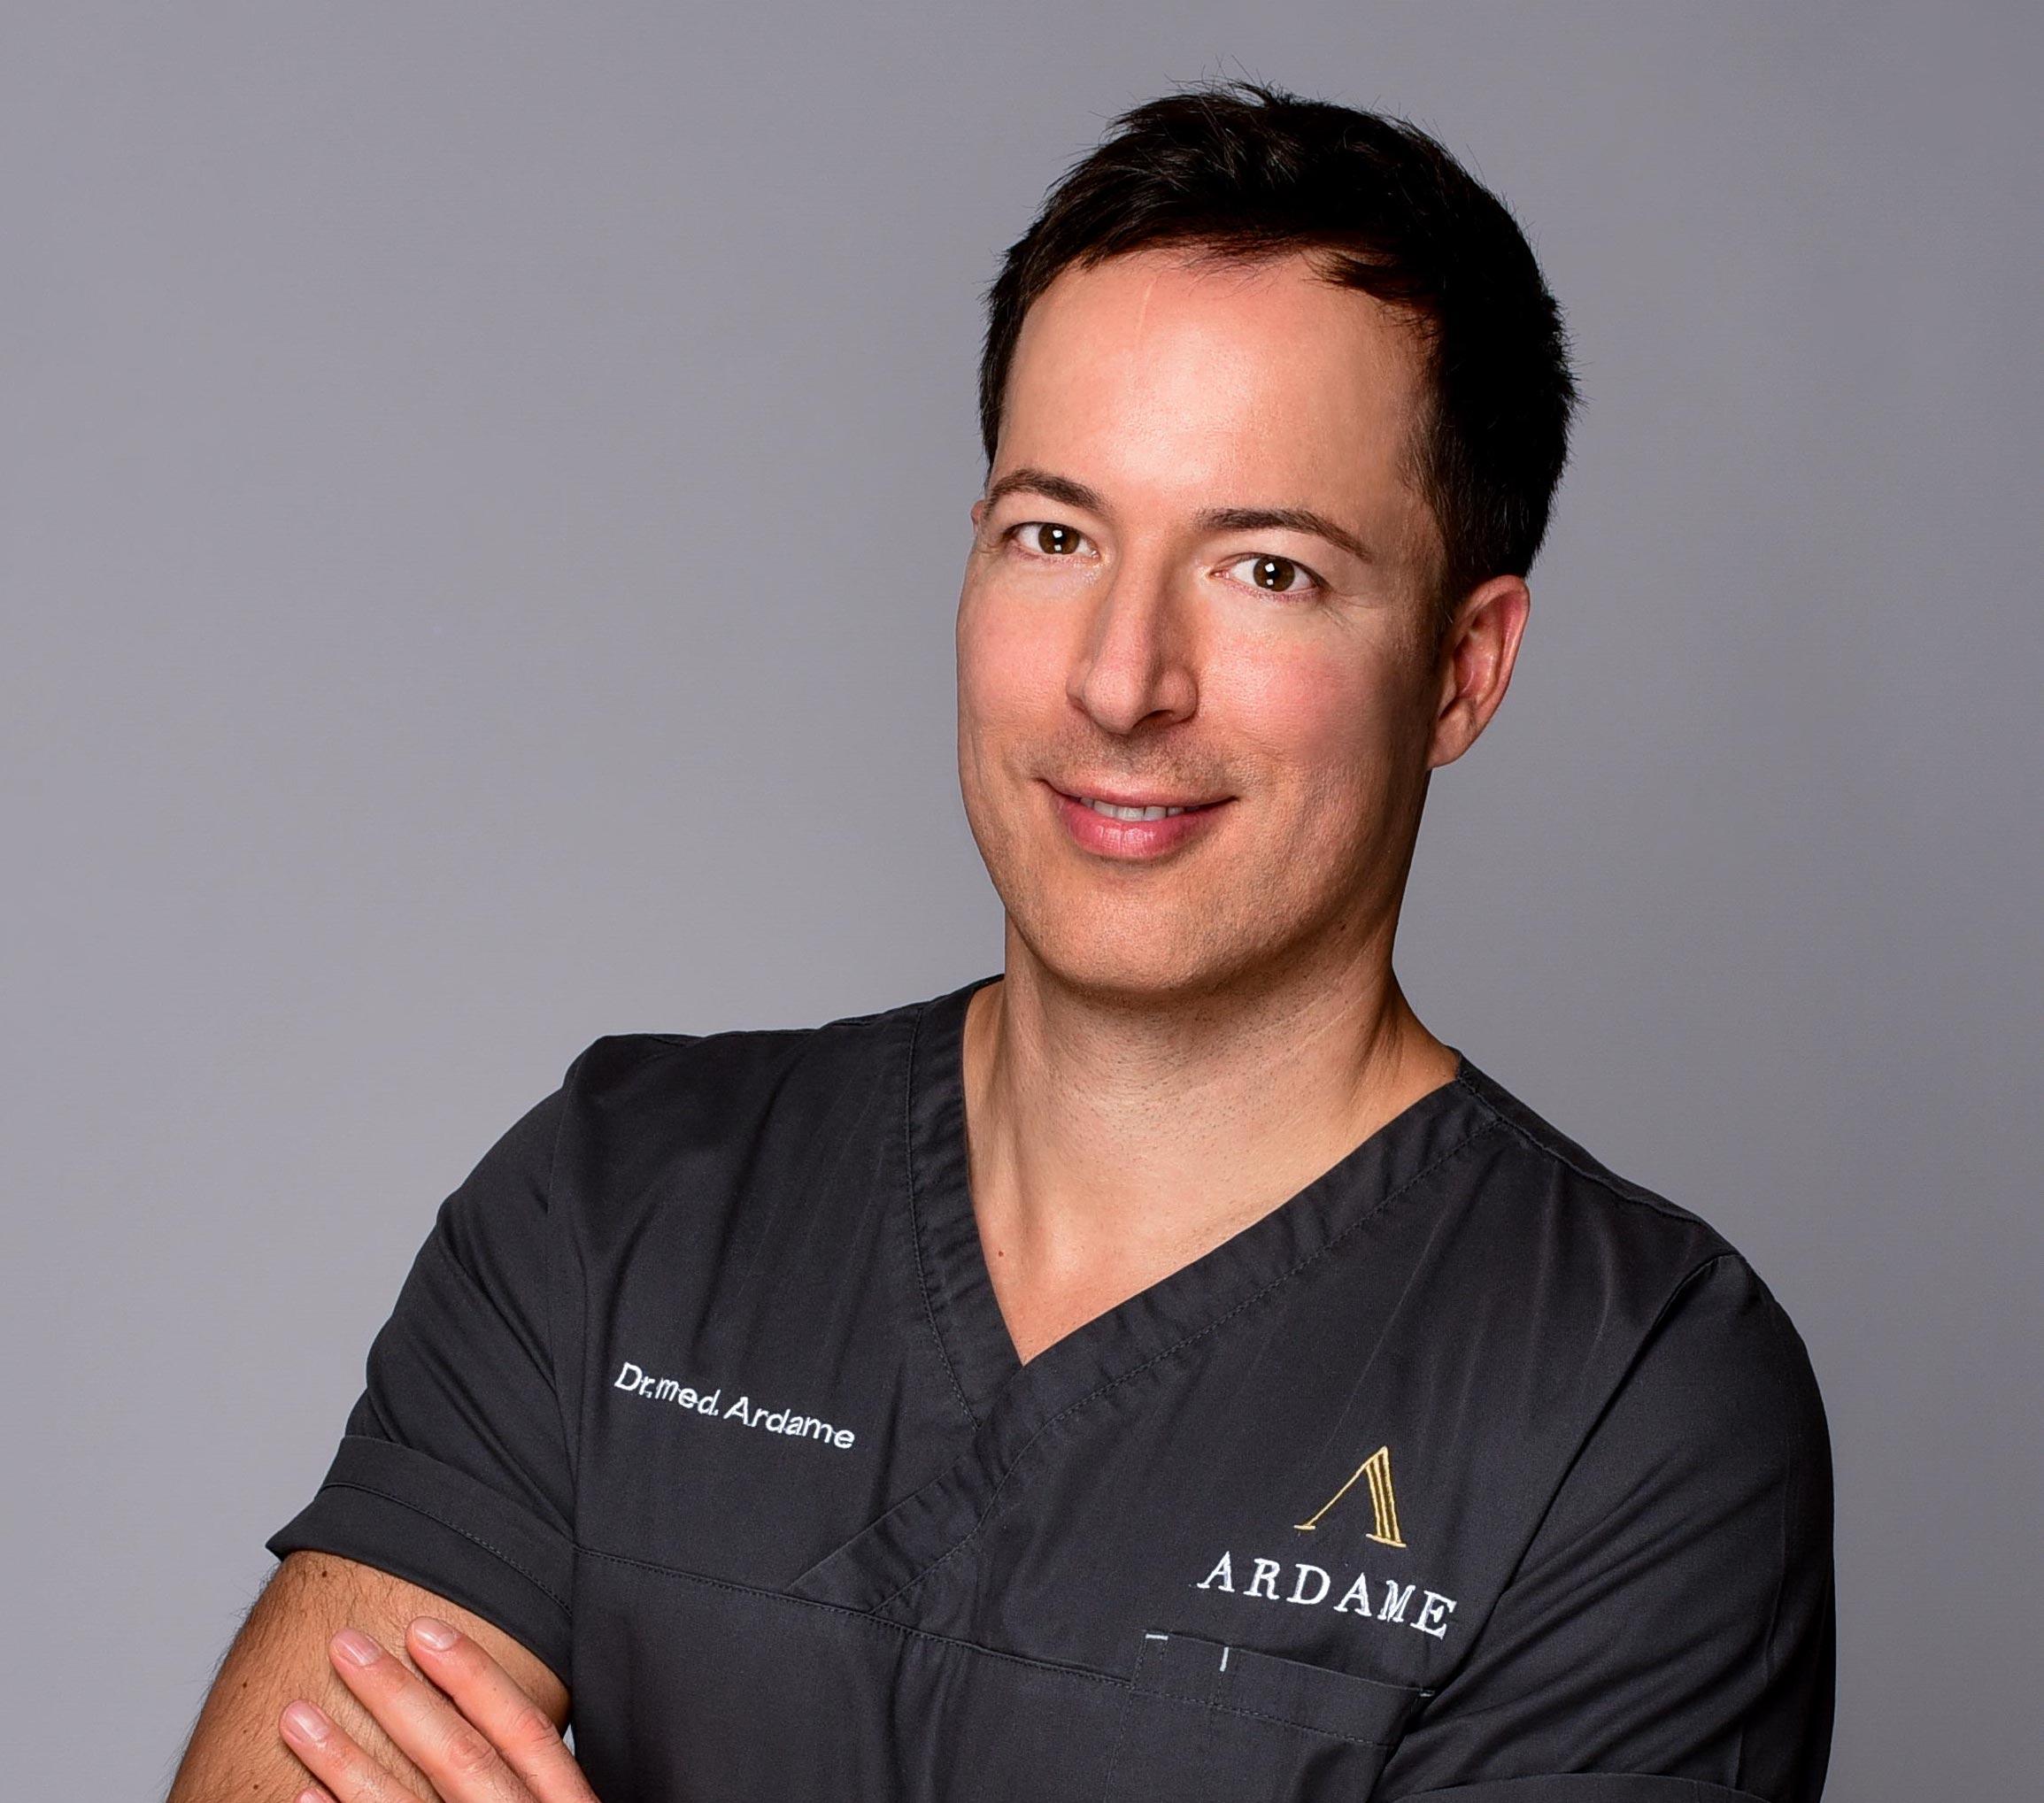 Www Kvetinas Bz Site Info: @B.Z. Berlin Dr. Med Fabian Ardame, Plastischer Chirurg